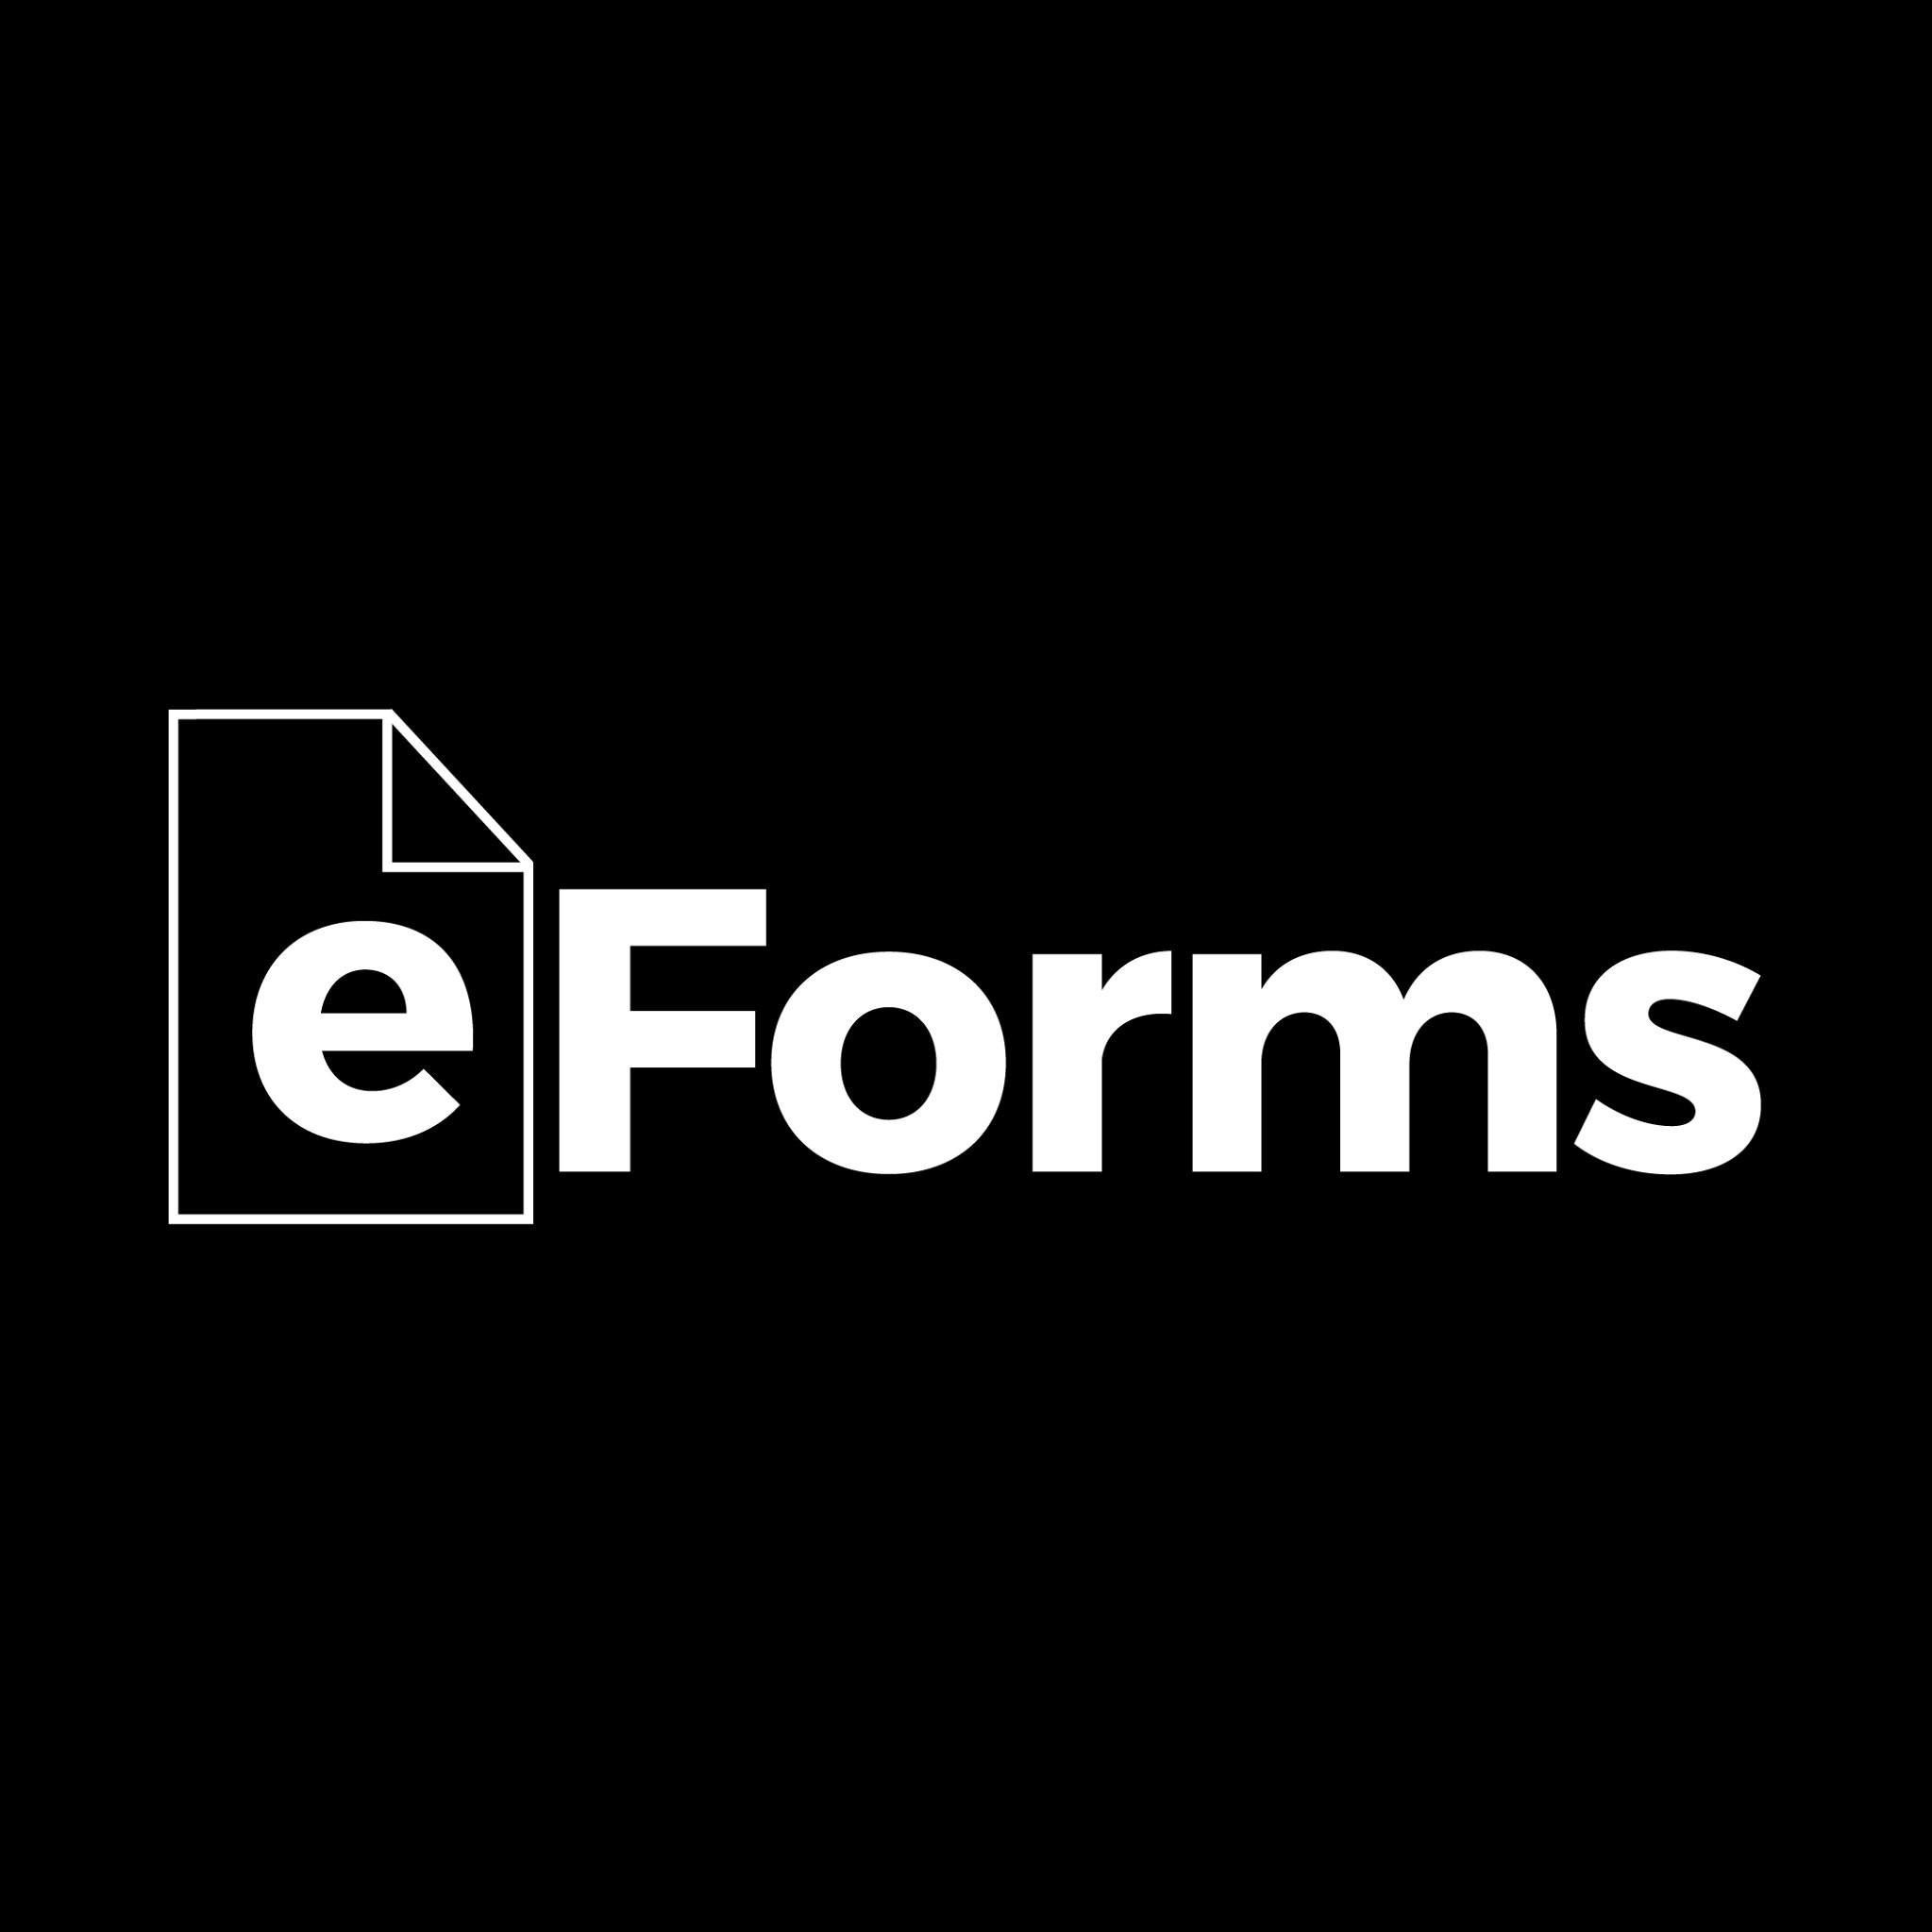 eForms Logo